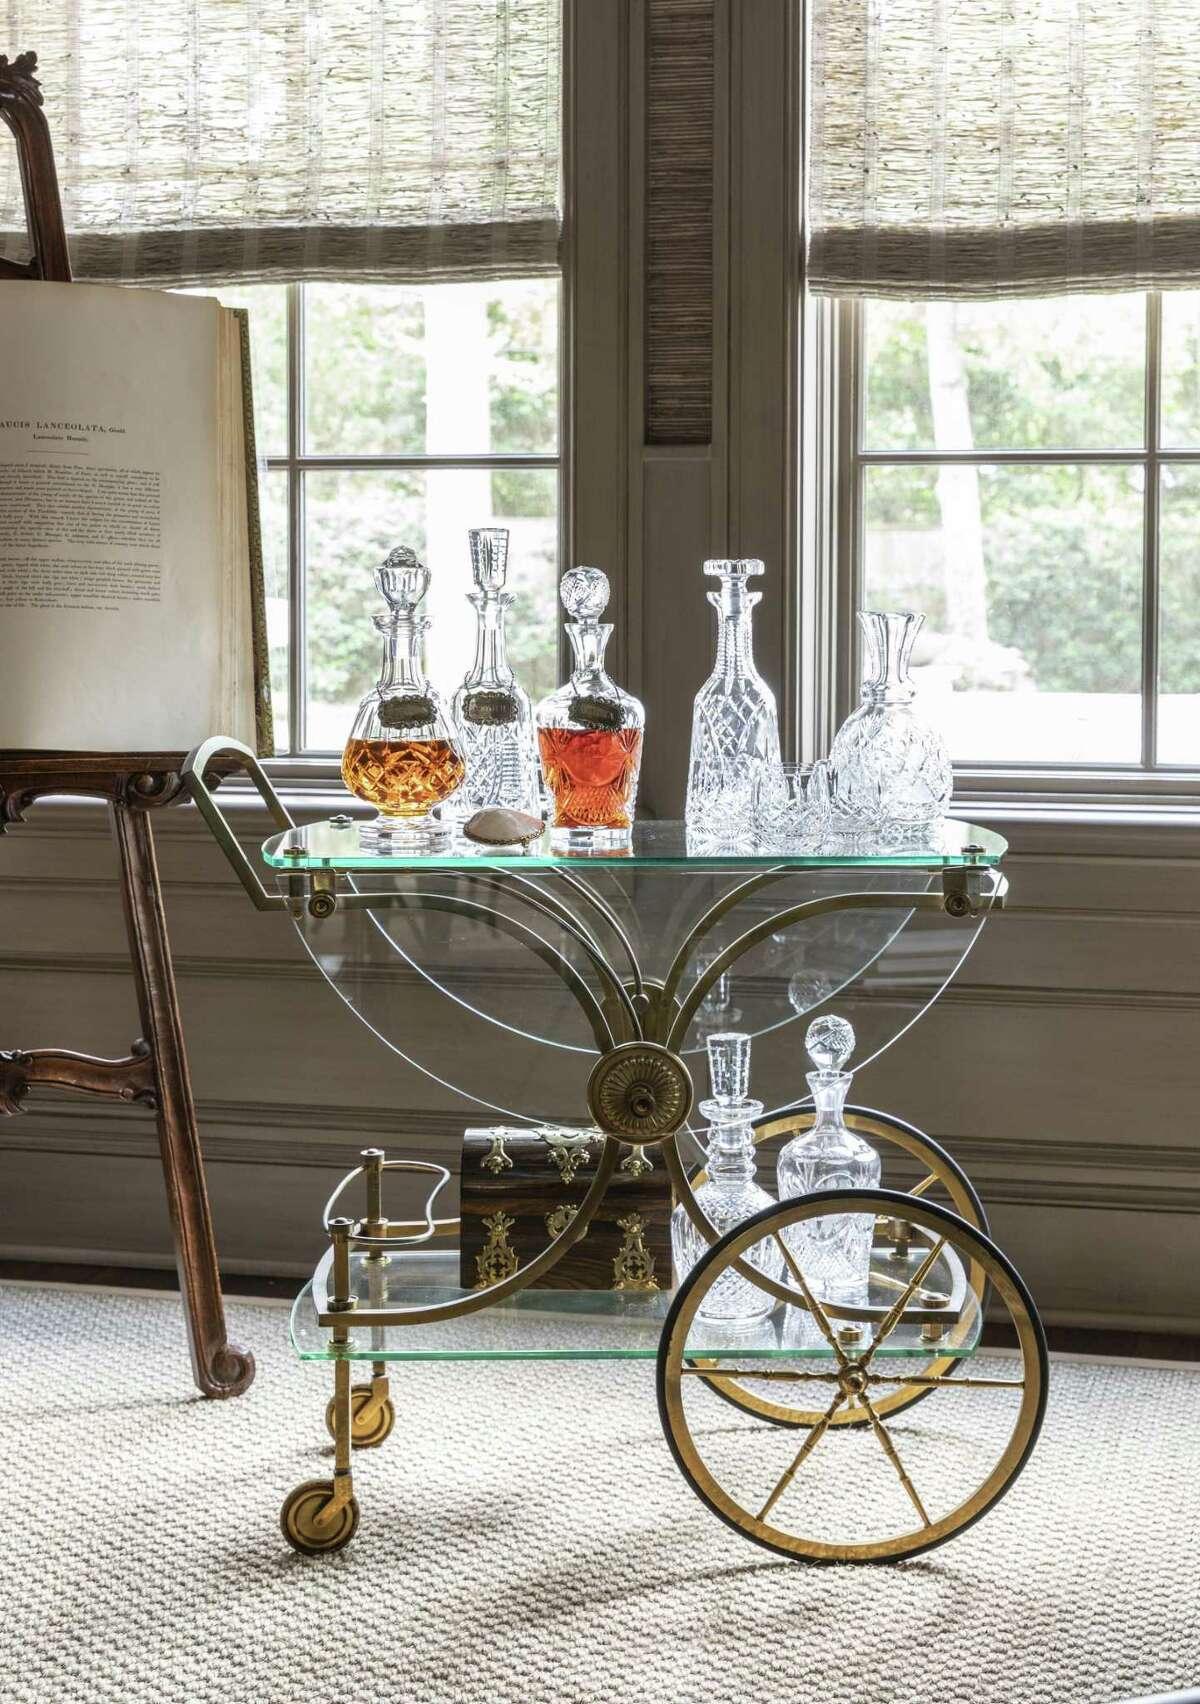 The Whites' interior designer, Sarah Eilers of Lucas/Eilers Design Associates, found this antique brass bar cart at an antiques store in Austin.